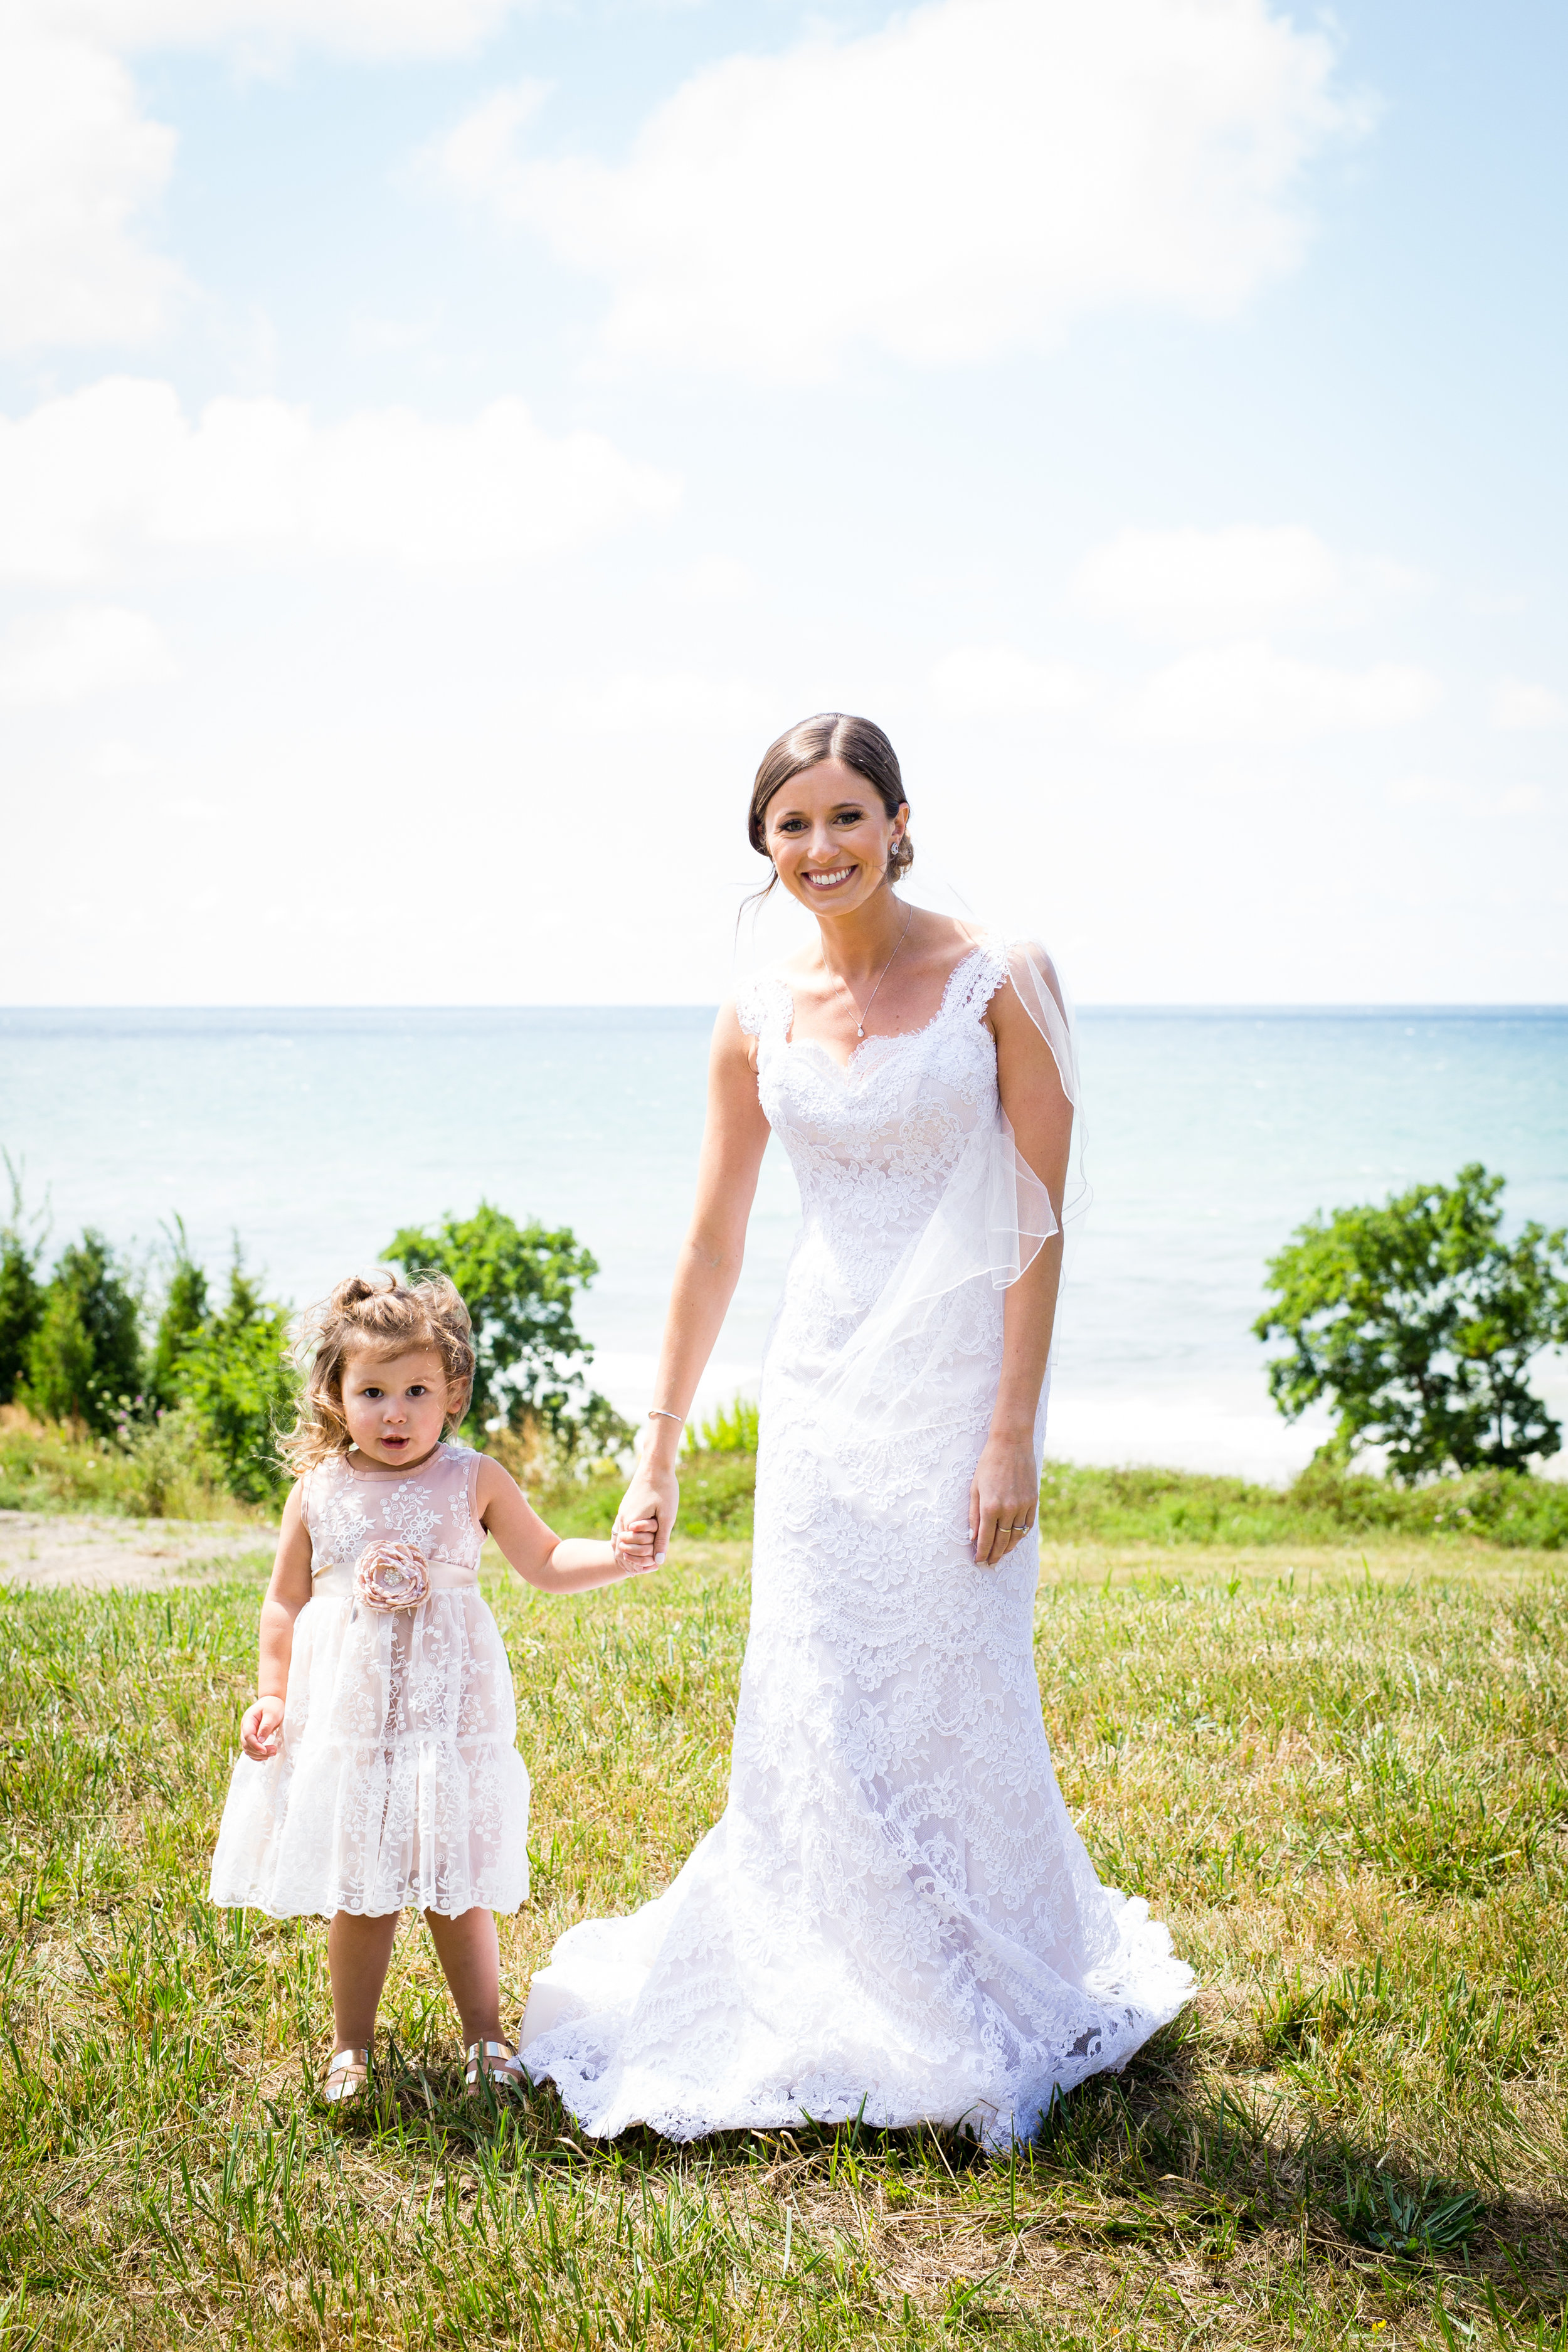 Tim&Polly_Wedding_12CornerVineyard_blog029.JPG